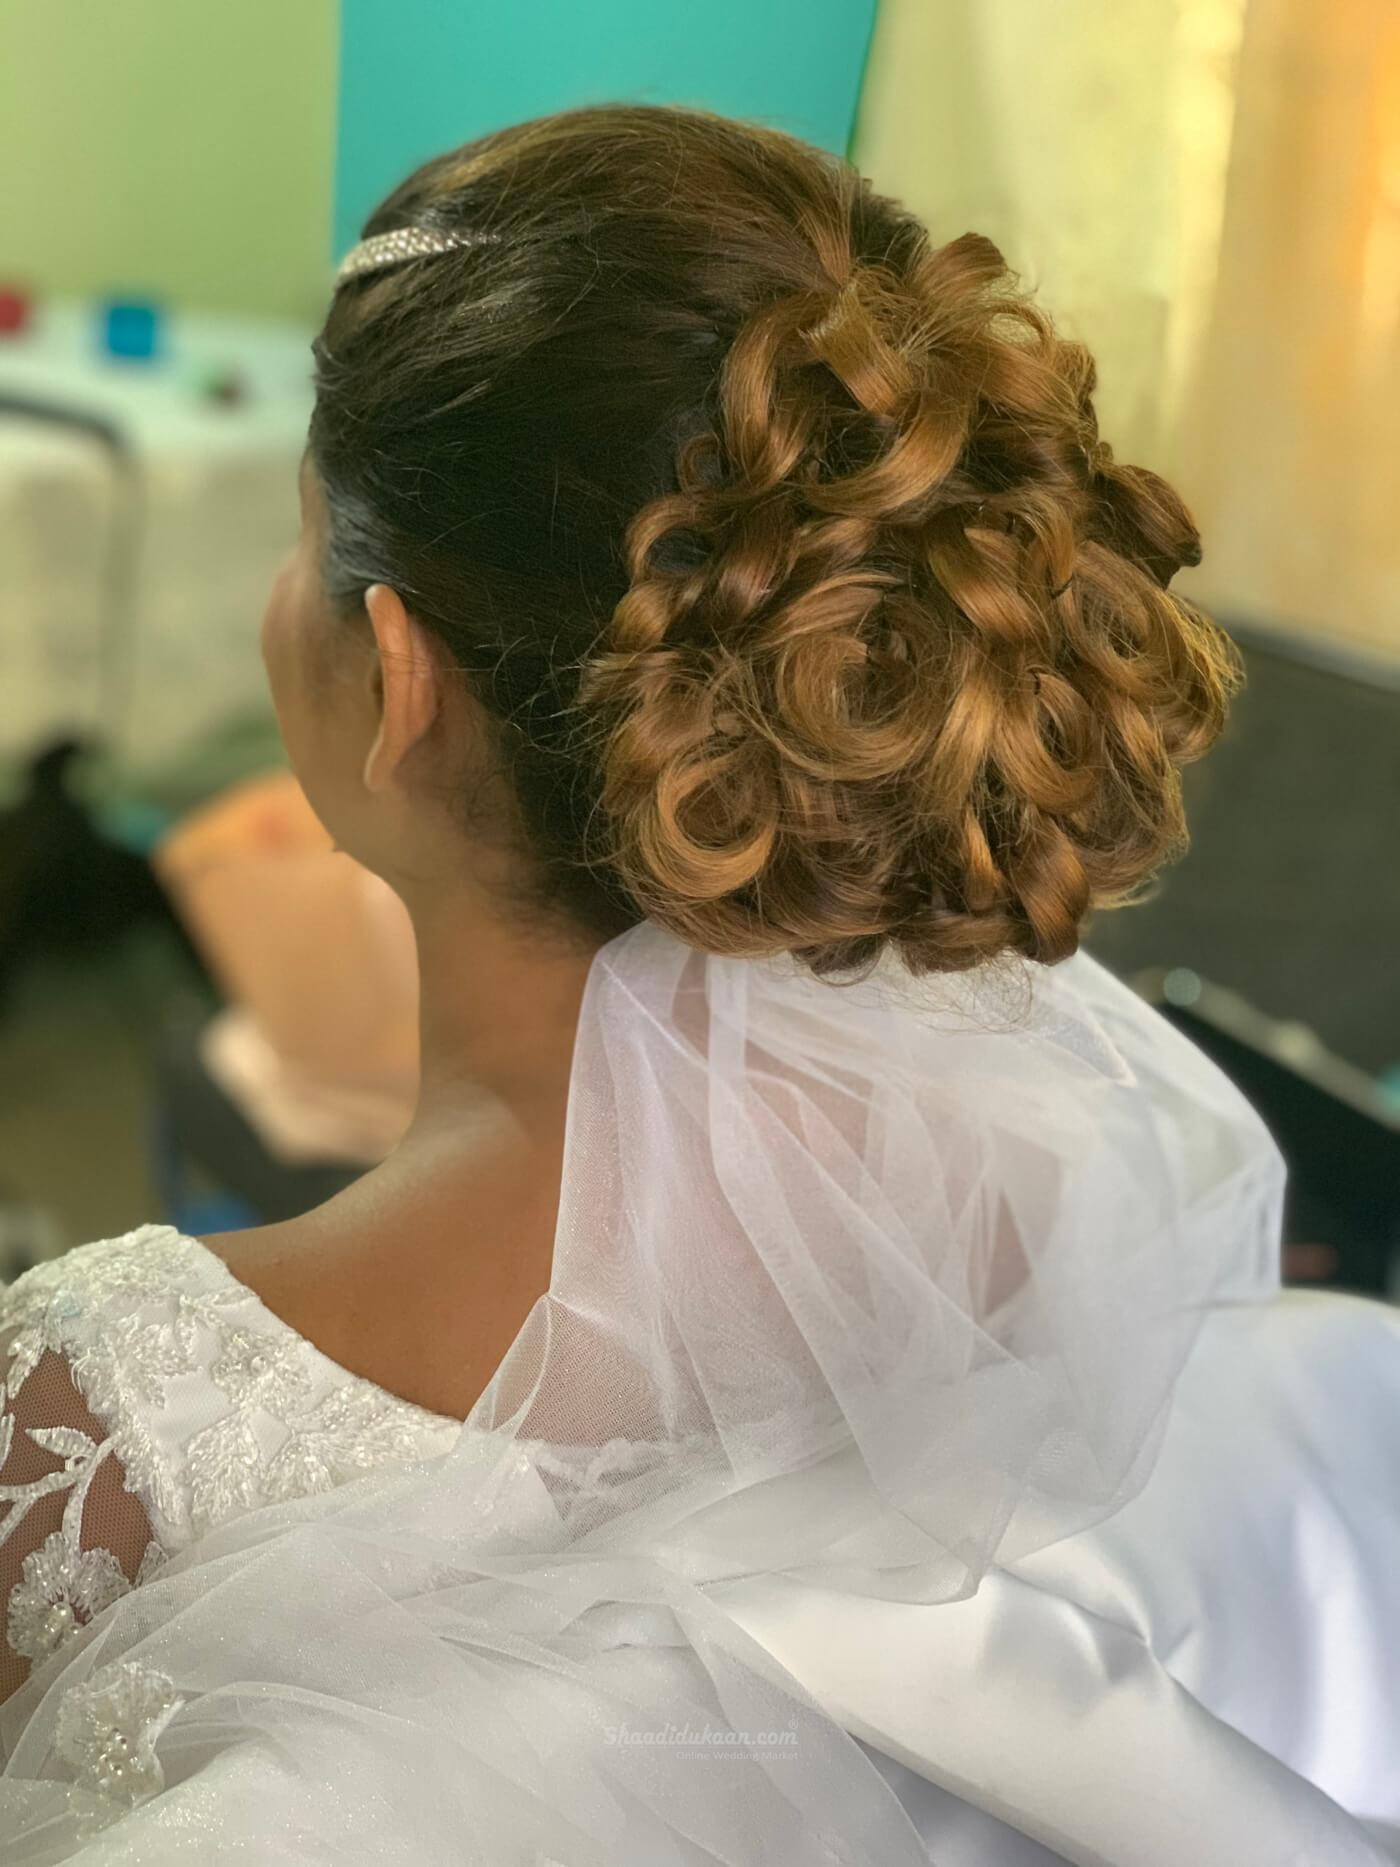 Marissa Pro Makeup Artist & Hairstylist